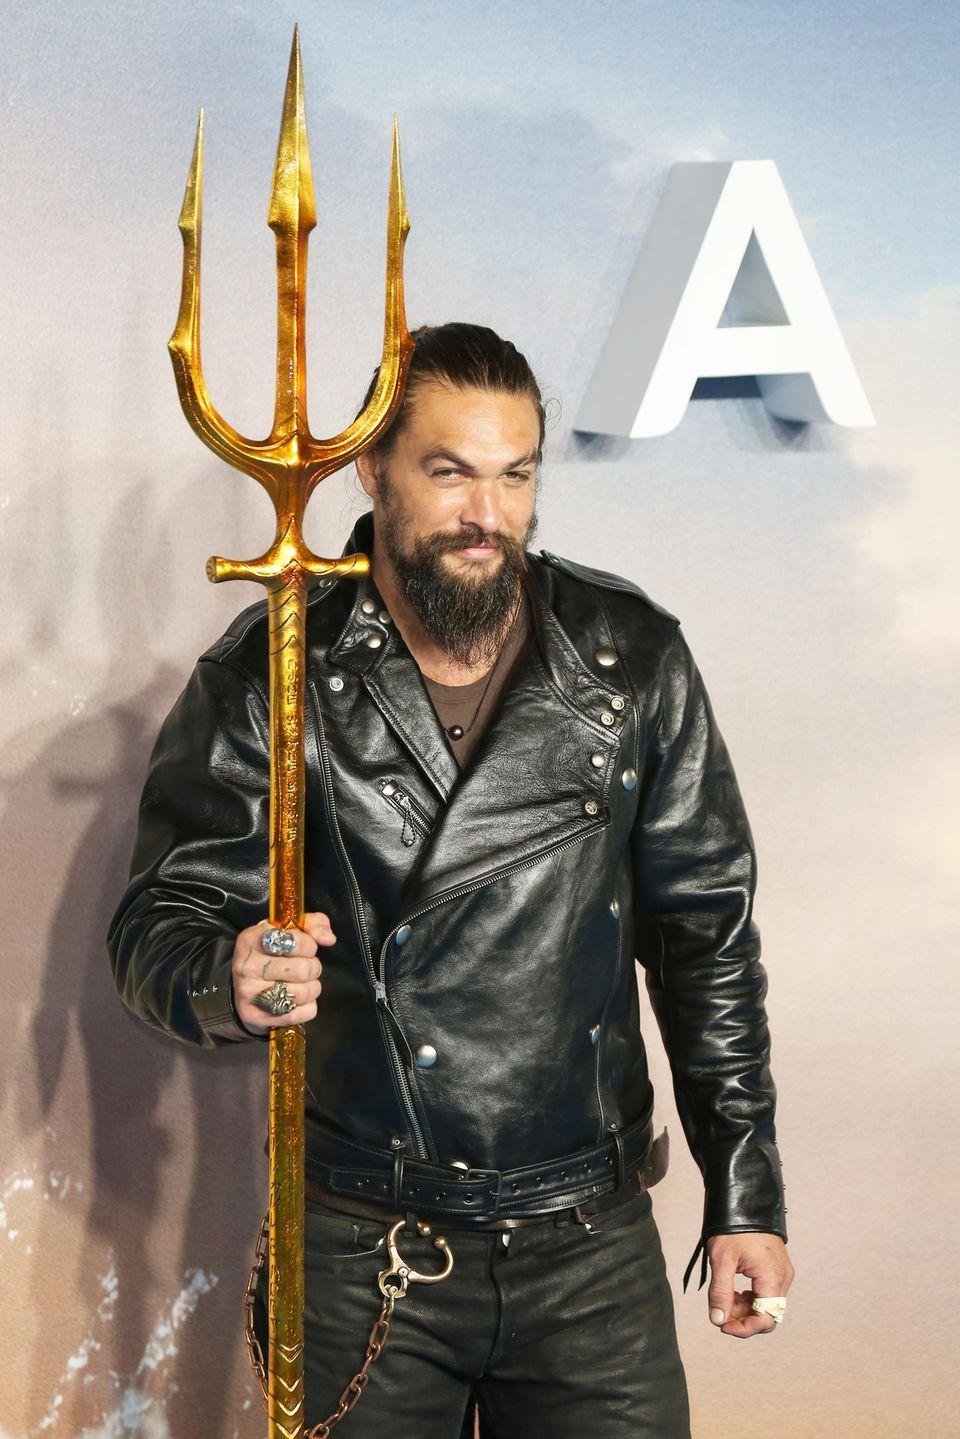 26. November 2018  Nicht ohne meinen Dreizack! Schauspieler Jason Momoa, er verkörpert den Helden Aquaman, bei der Weltpremiere dergleichnamigen Comicverfilmung in London.